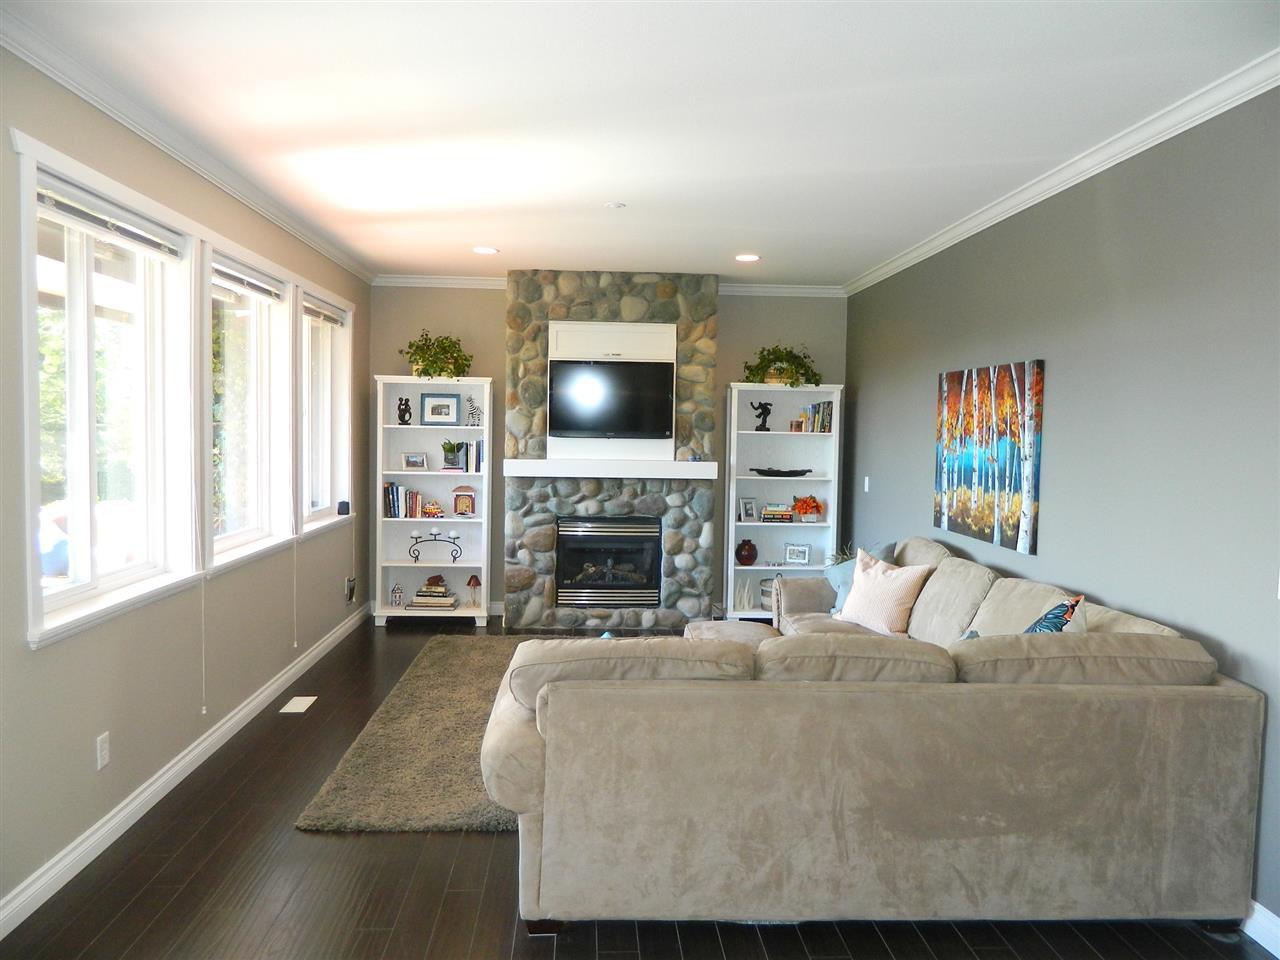 Photo 9: Photos: 24332 104 AVENUE in Maple Ridge: Albion House for sale : MLS®# R2051414